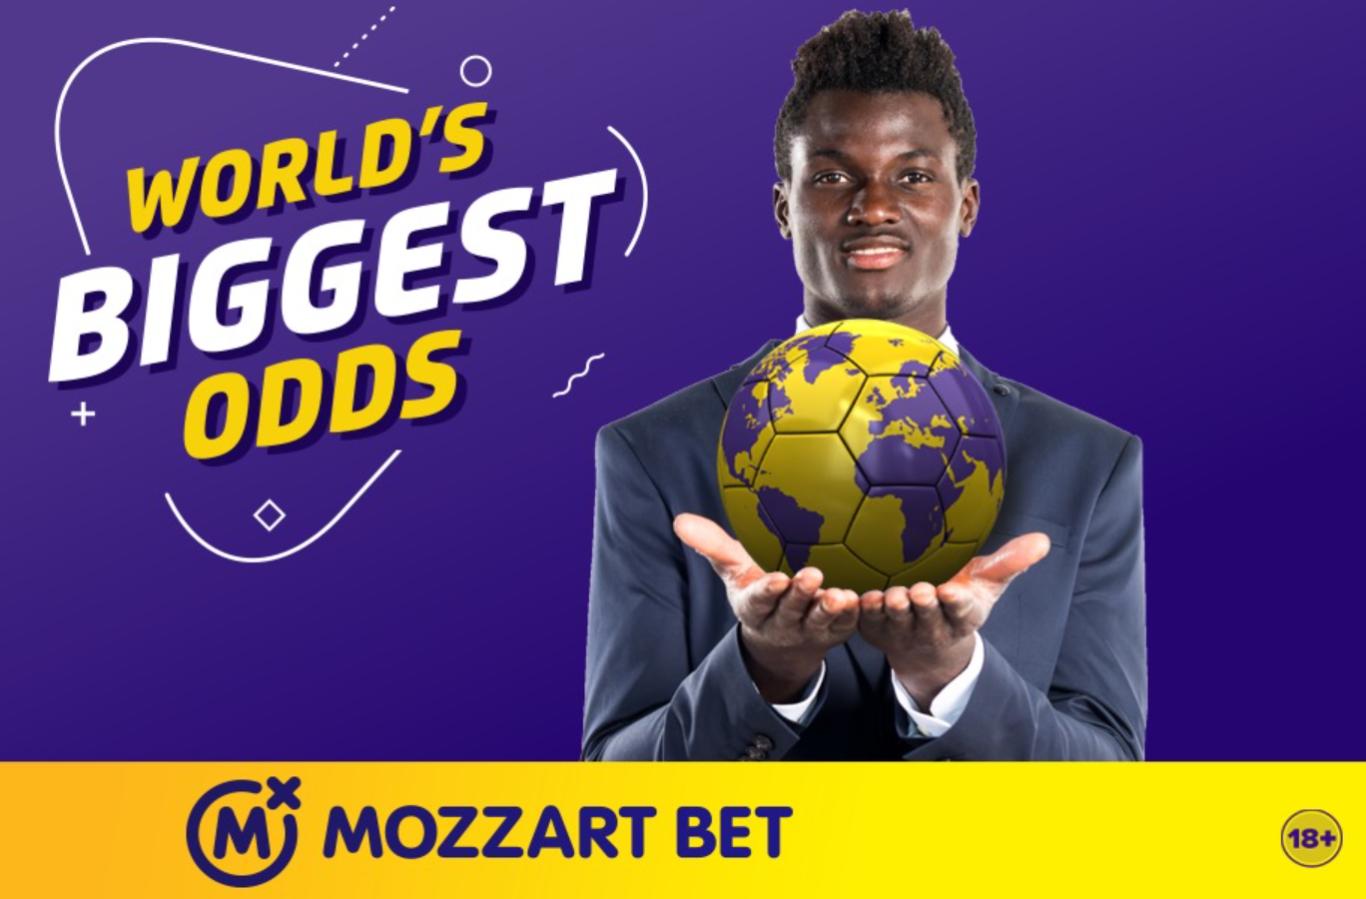 Mozzart Sports Betting Promotions